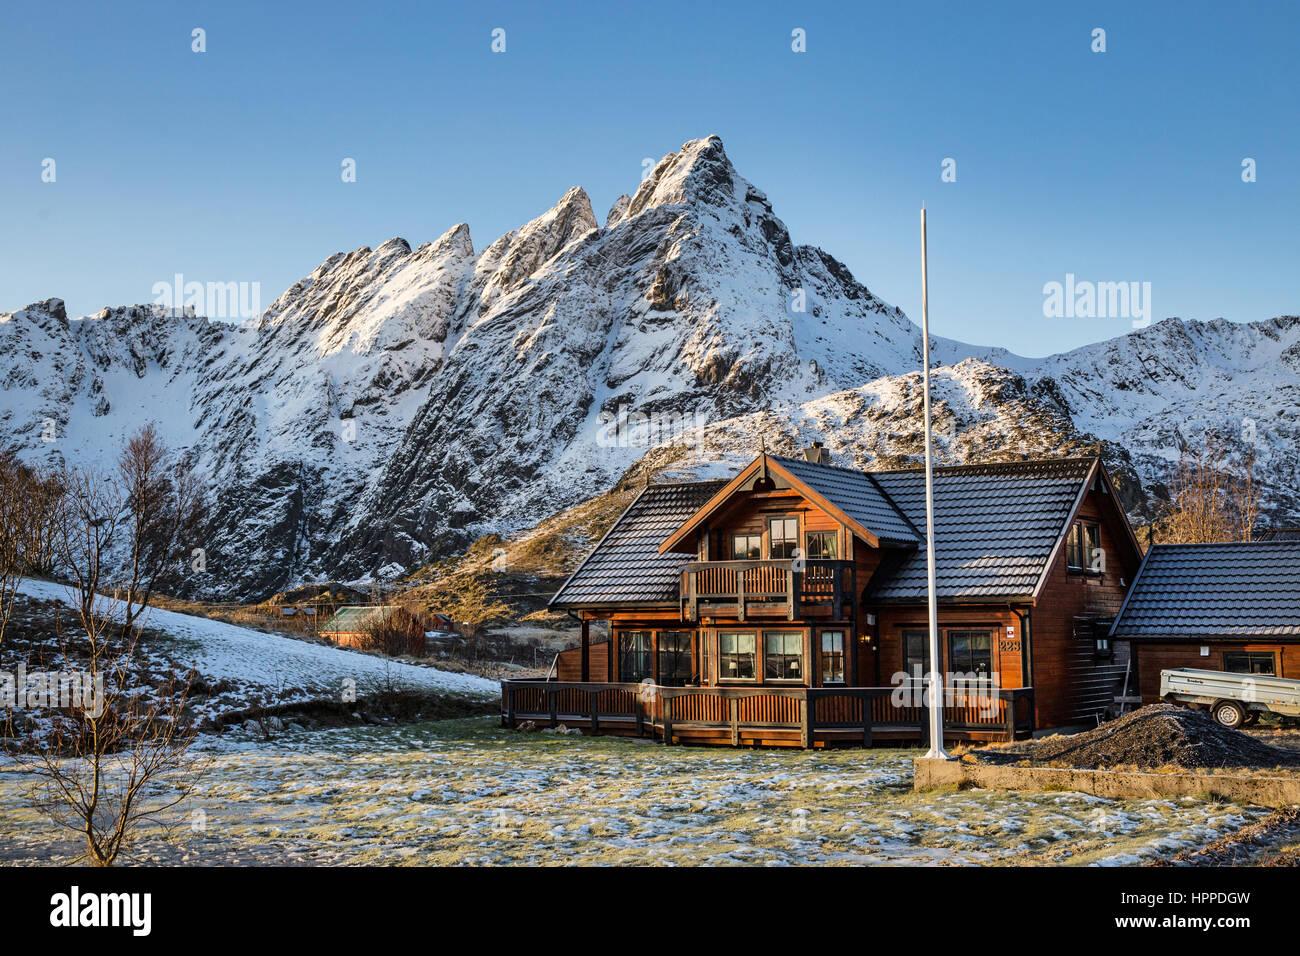 traditional wooden house, Ballstad, Lofoten Islands, Norway, Europe - Stock Image